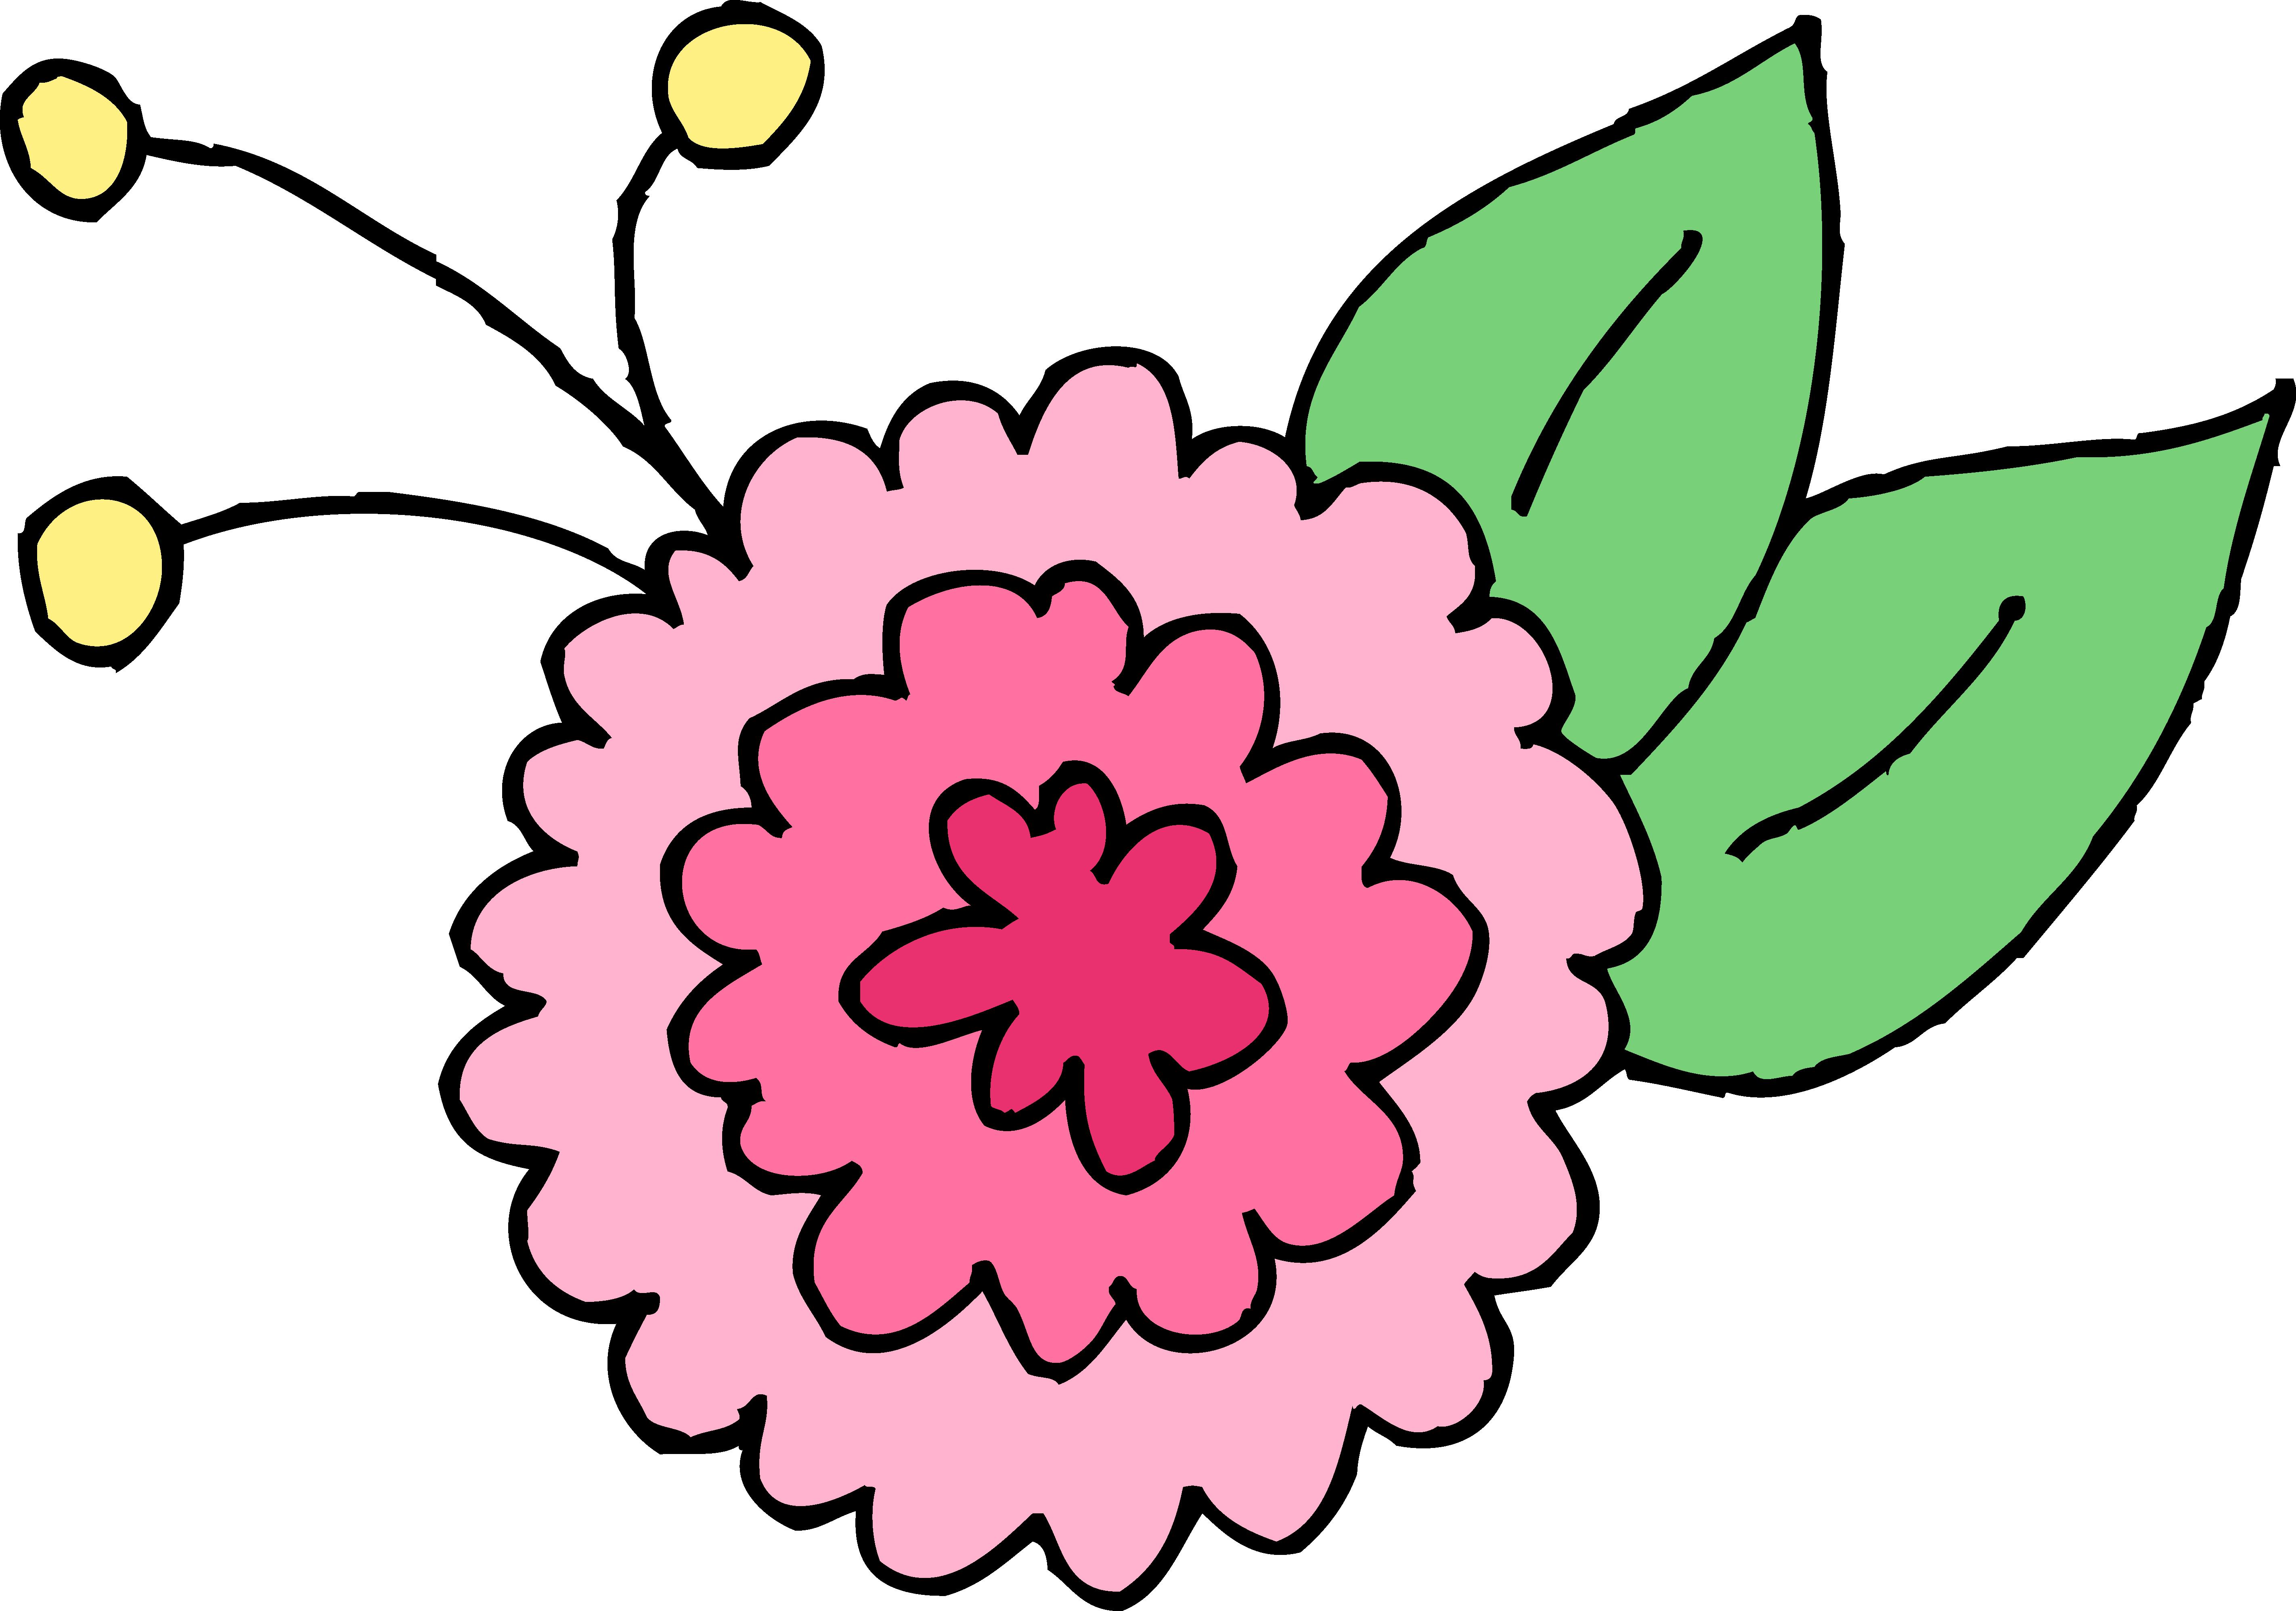 Flower Cartoon Images Clipart Free Download Best Flower Cartoon